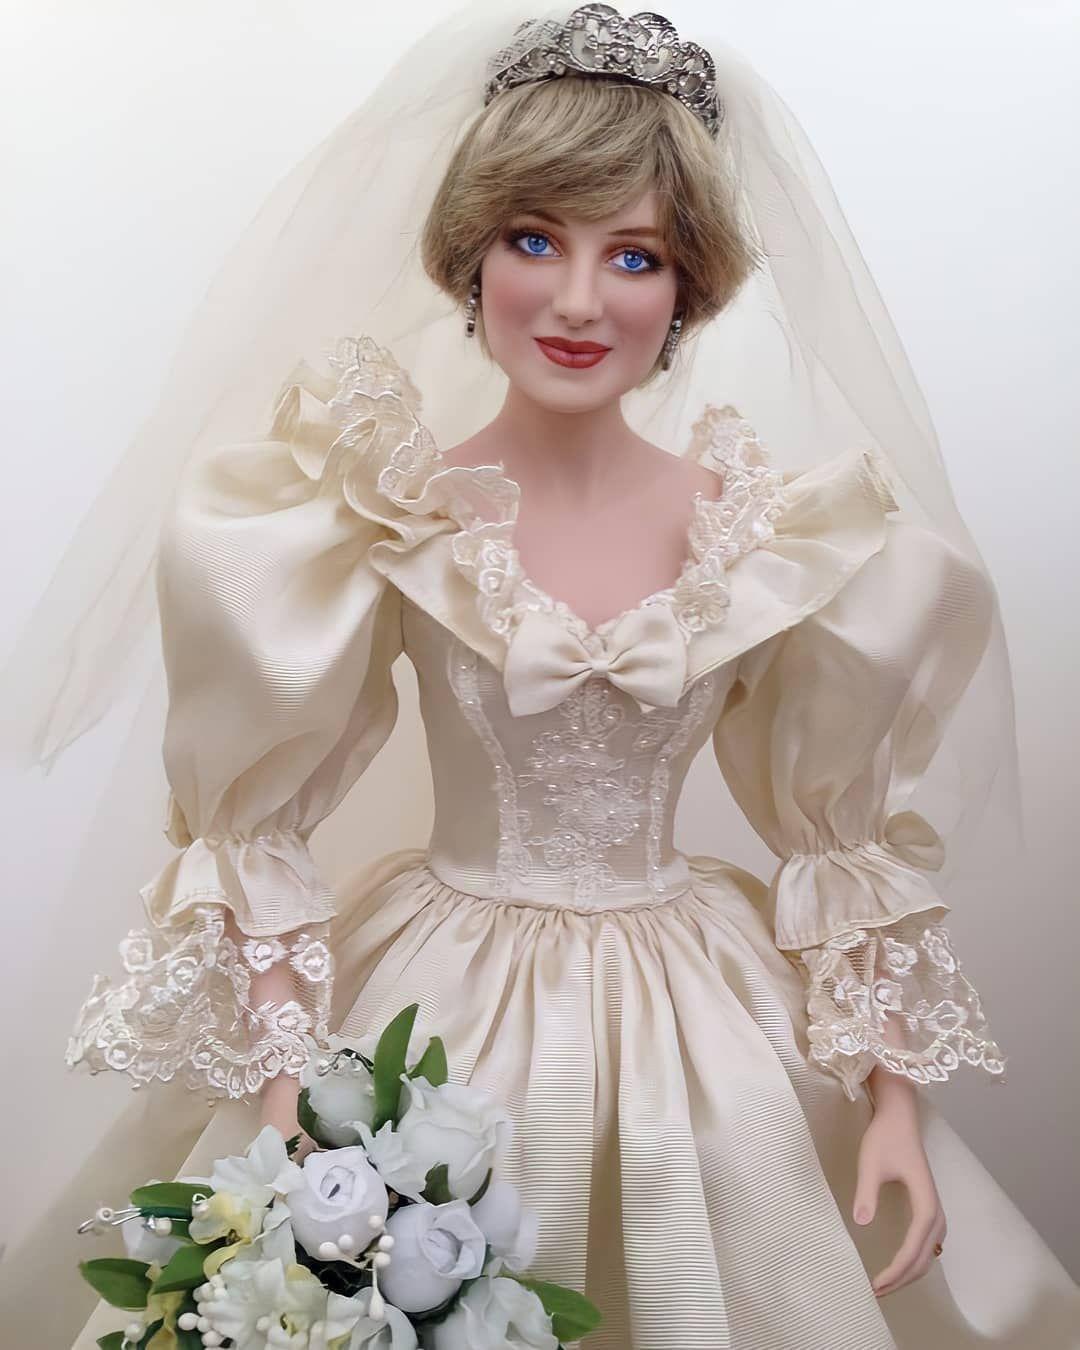 Royalty Fashion On Instagram Princess Diana Bride Doll Princessdiana Princessdianaofwales Ladyd In 2021 Bride Dolls Barbie Bridal Princess Diana Wedding [ 1350 x 1080 Pixel ]